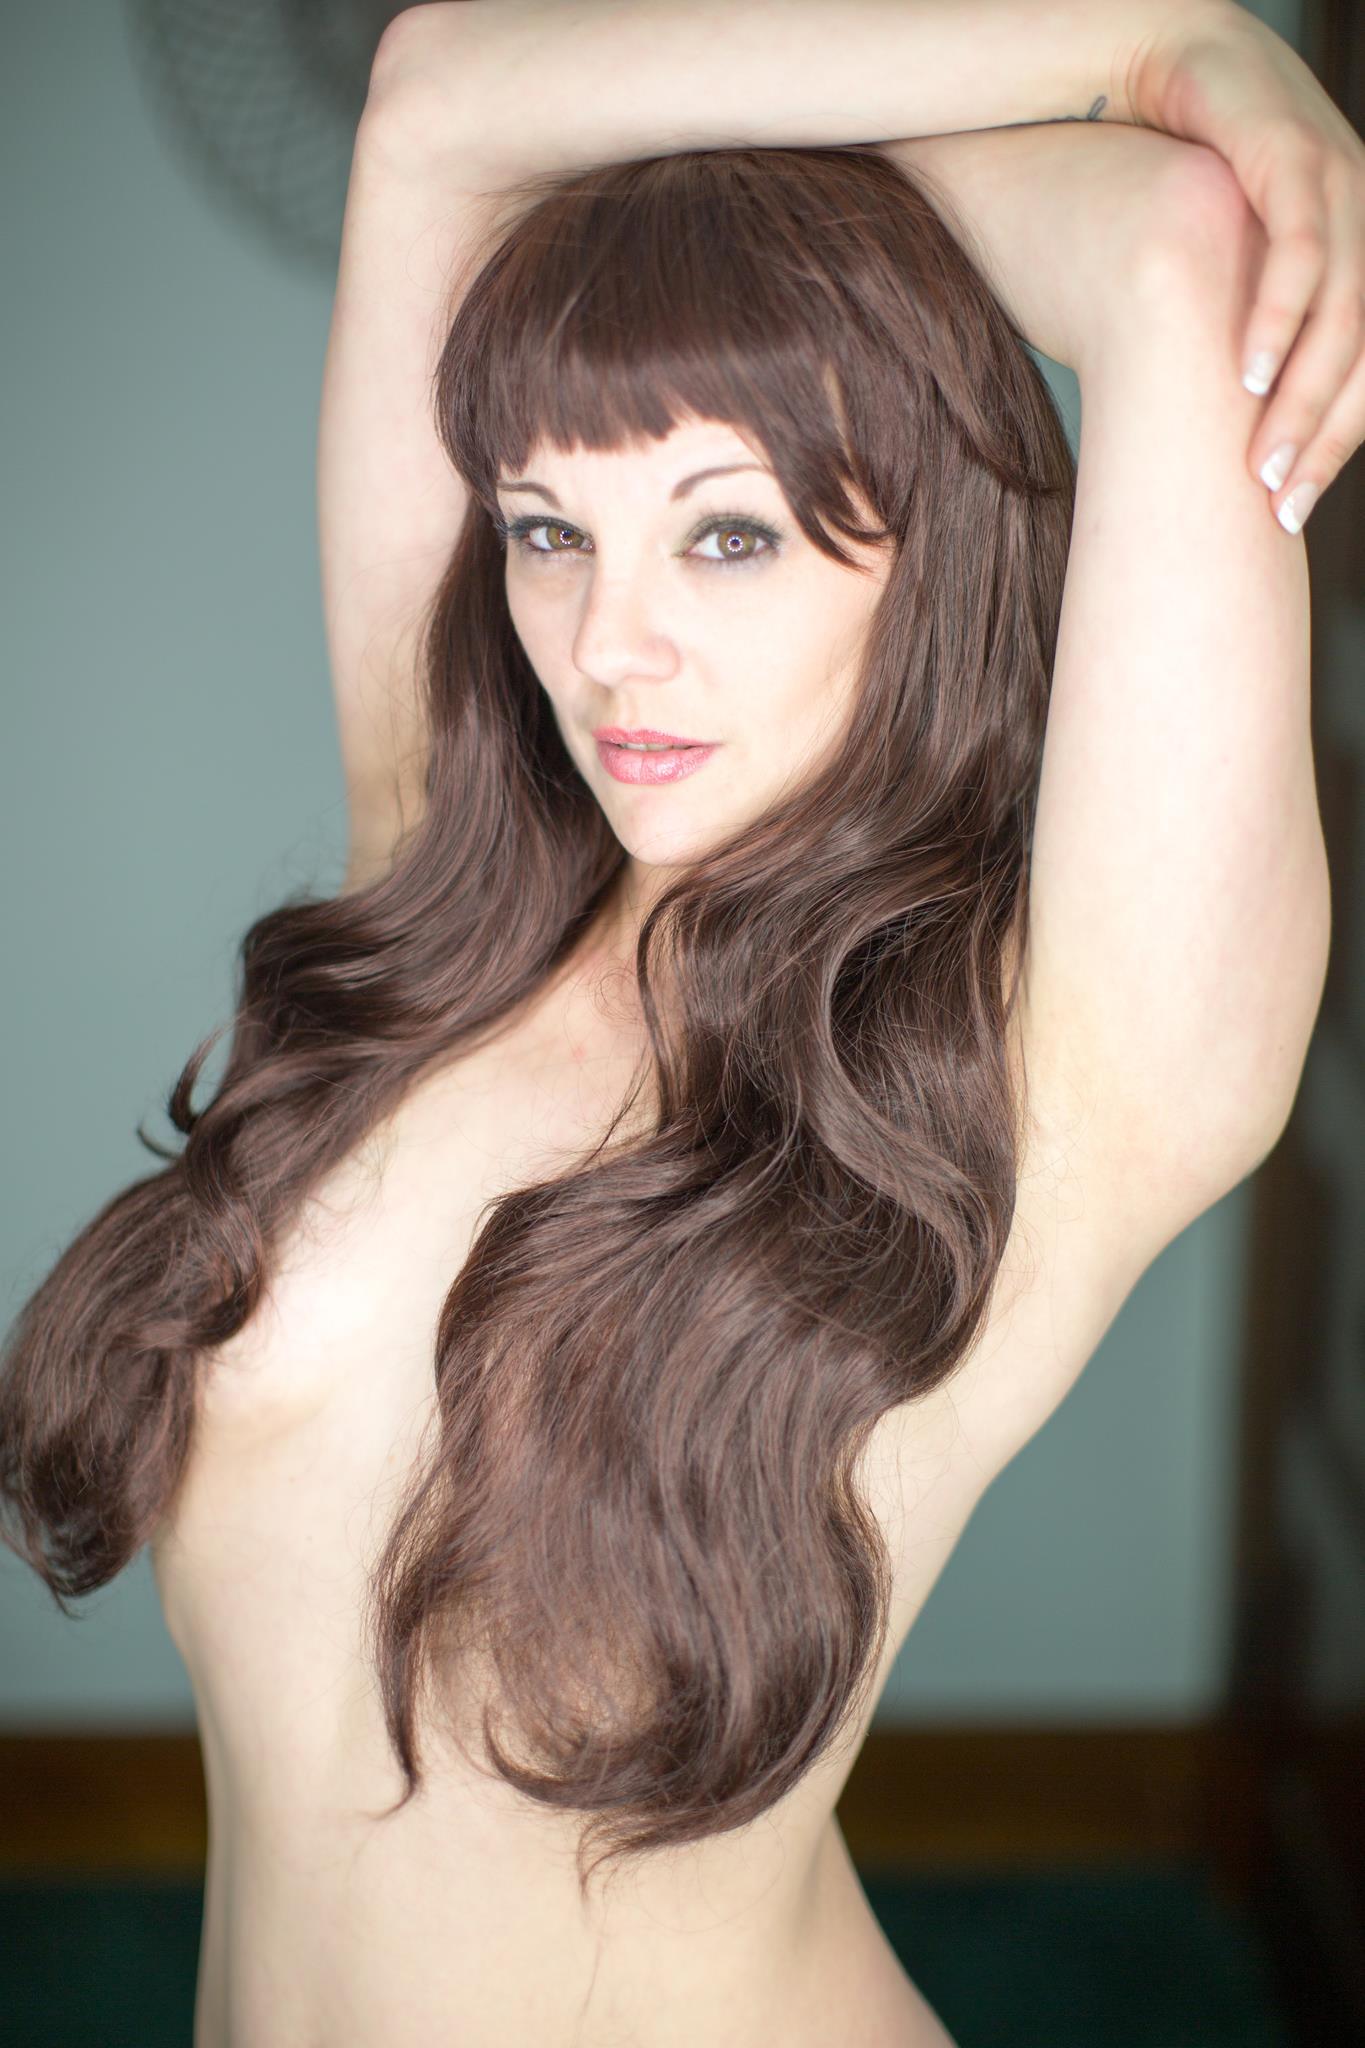 isabel-marie-vinson-boobs